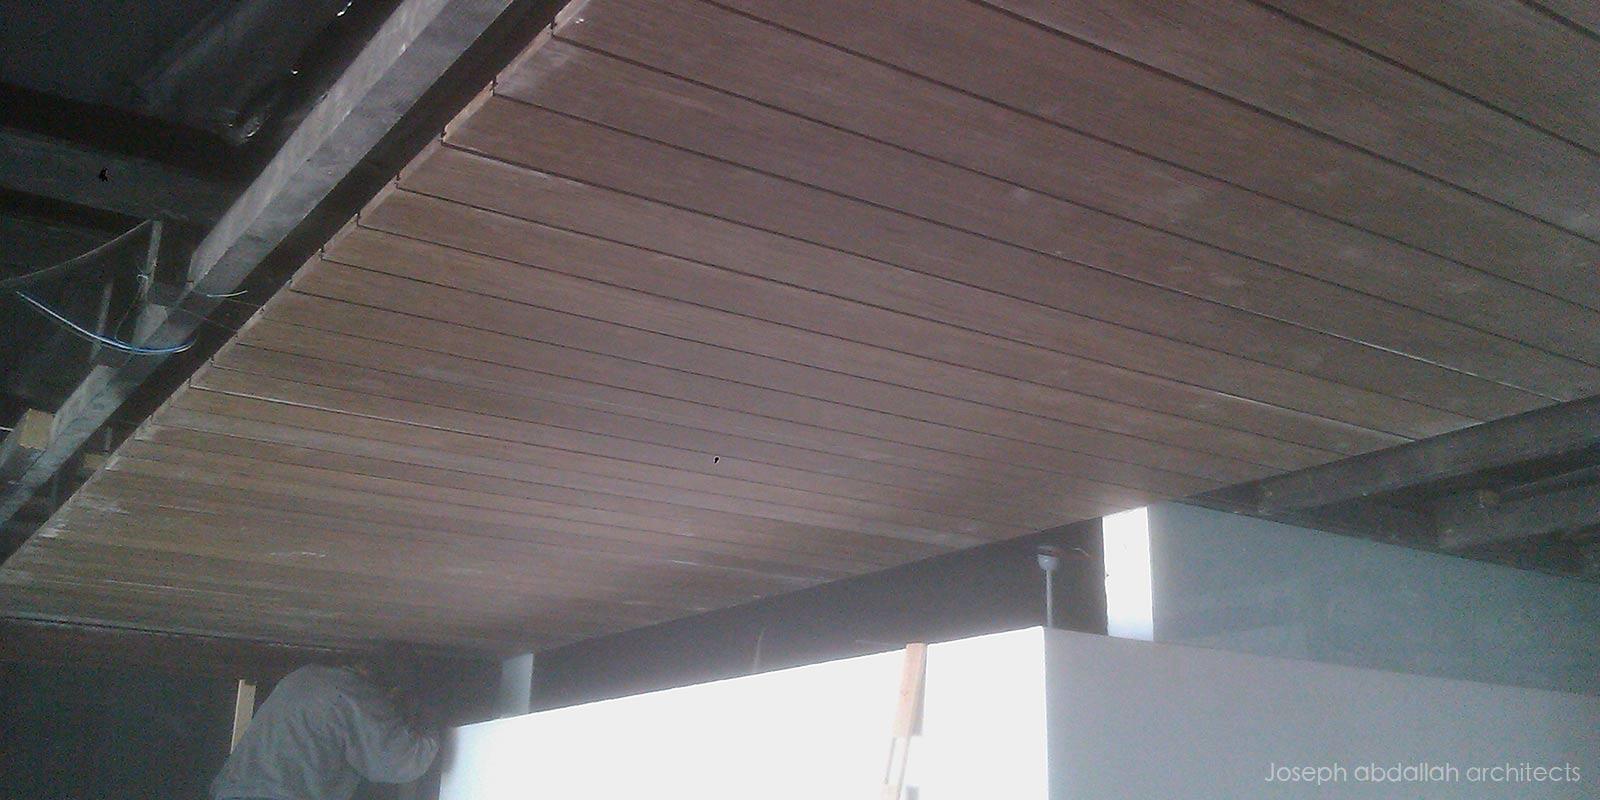 halat-sur-mer-hamod-chalet-interior-architecture-joseph-abdallah-architects-7